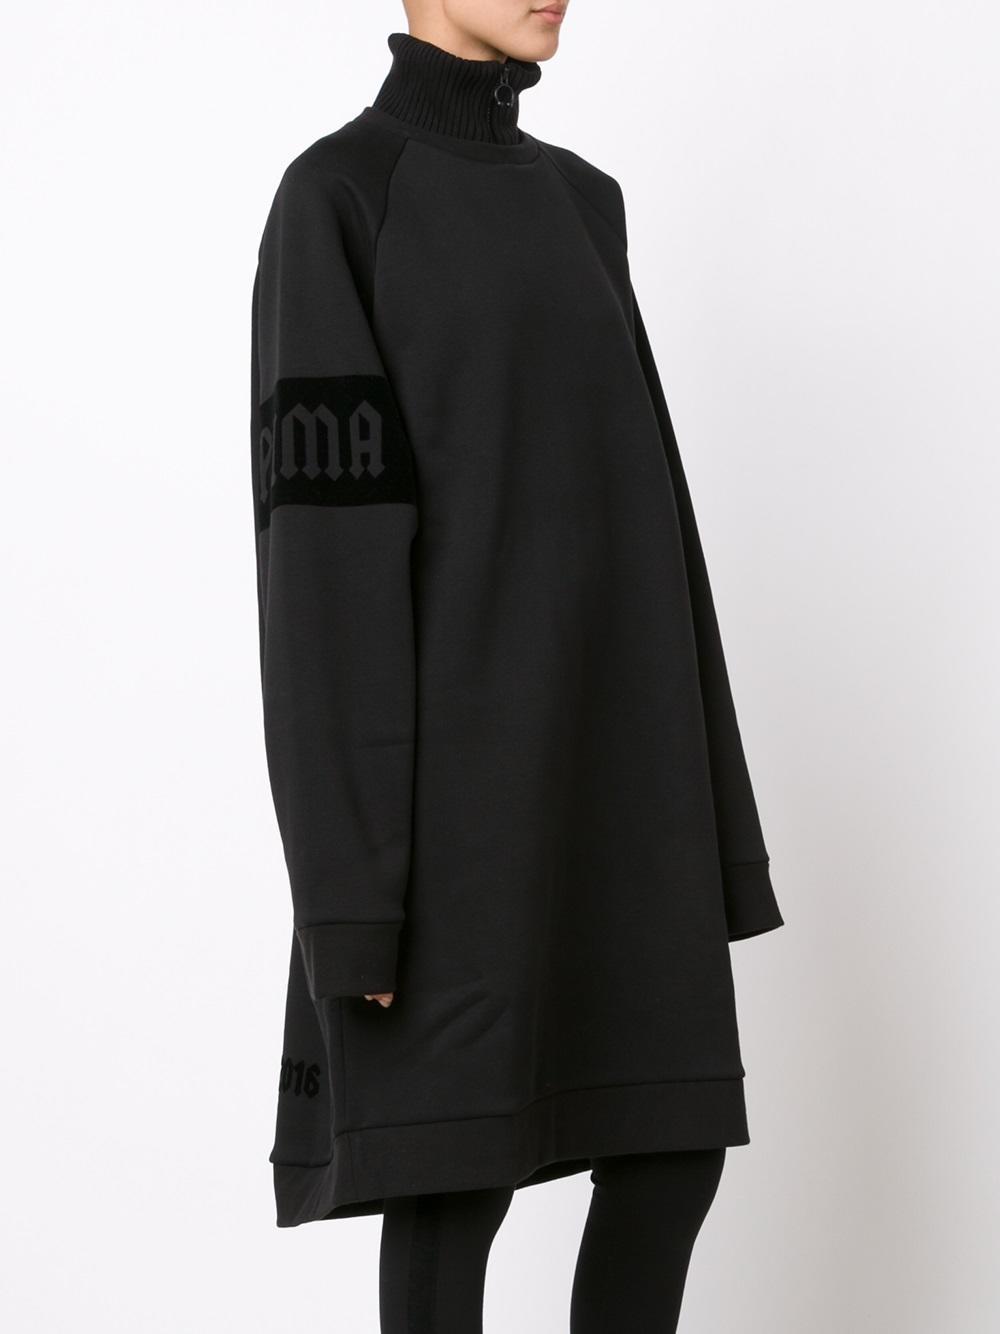 puma fenty x rihanna oversize neck zip pullover in black lyst. Black Bedroom Furniture Sets. Home Design Ideas